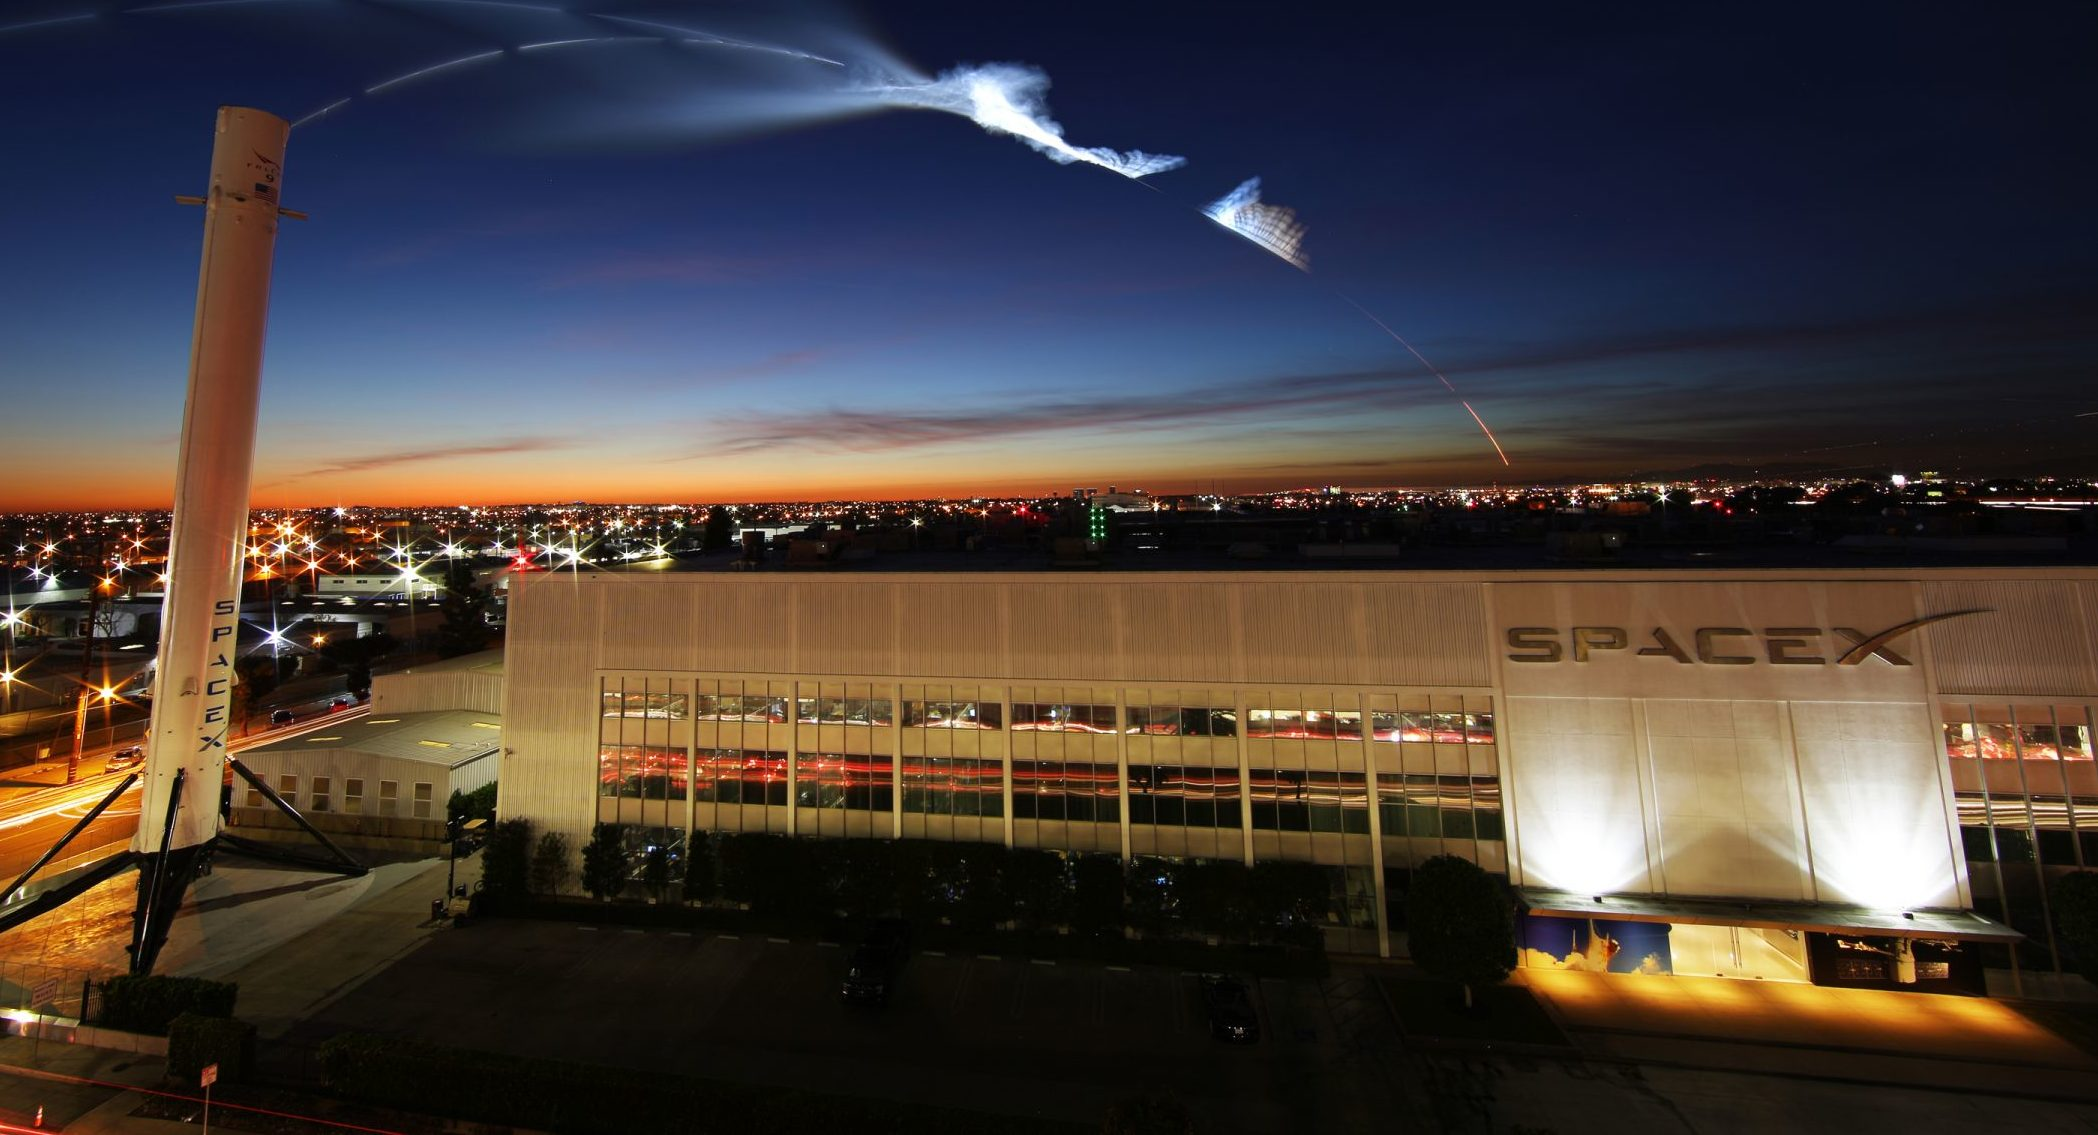 spacex evolution - photo #18